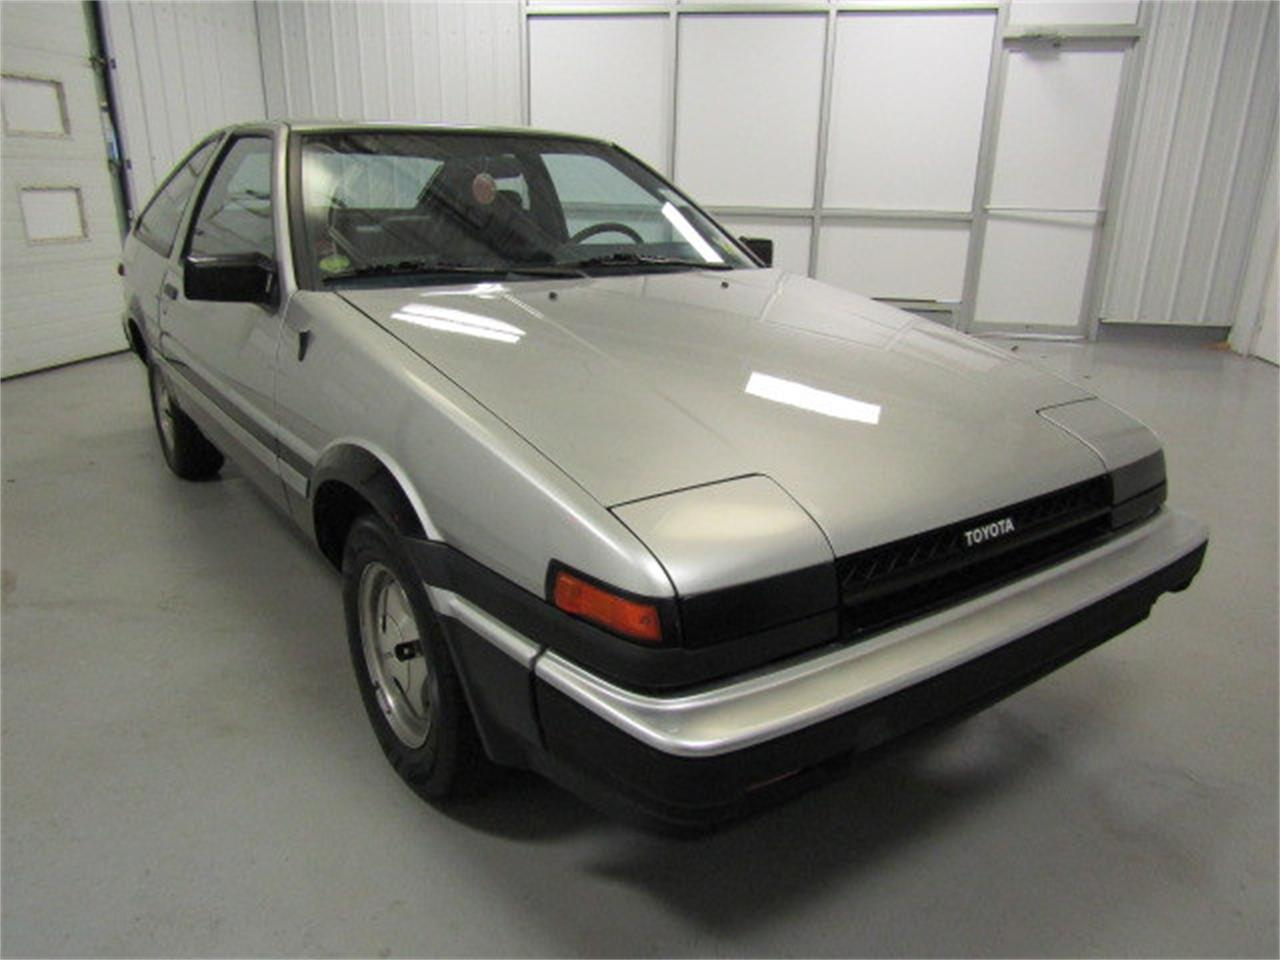 Corolla For Sale >> 1984 Toyota Corolla For Sale Classiccars Com Cc 1003216